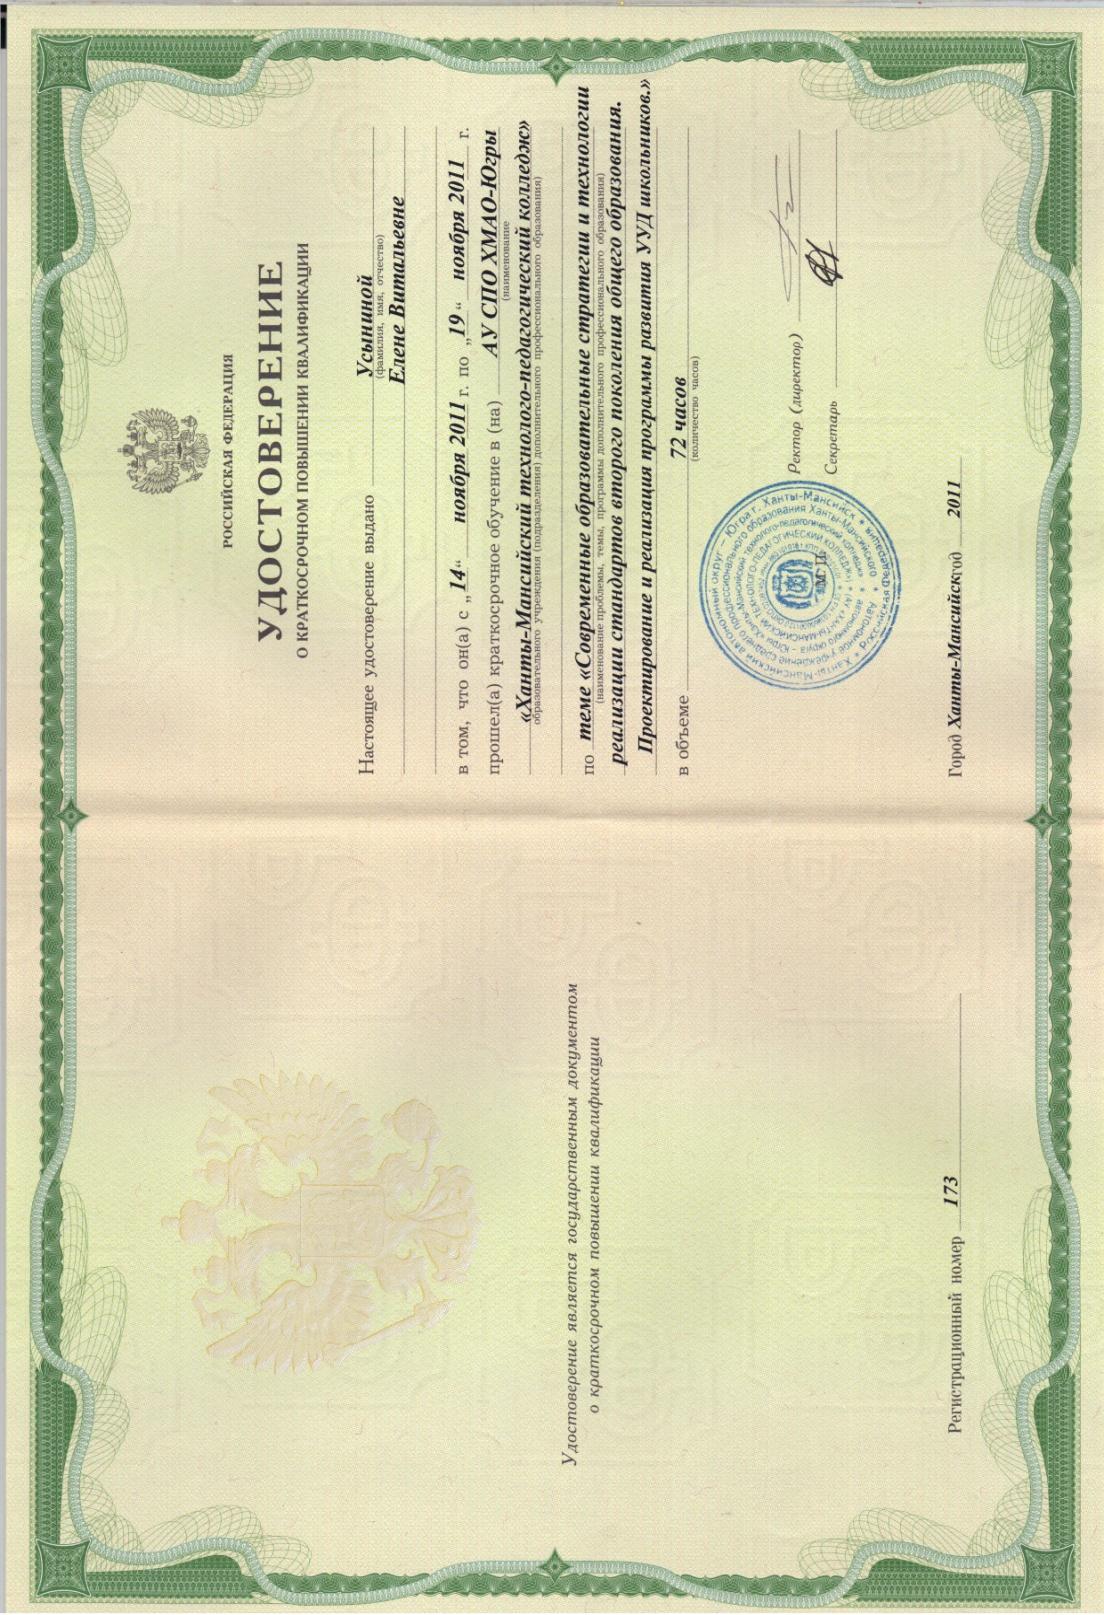 C:\Users\Елена\Documents\Panasonic\MFS\Scan\20141123_204656.jpg